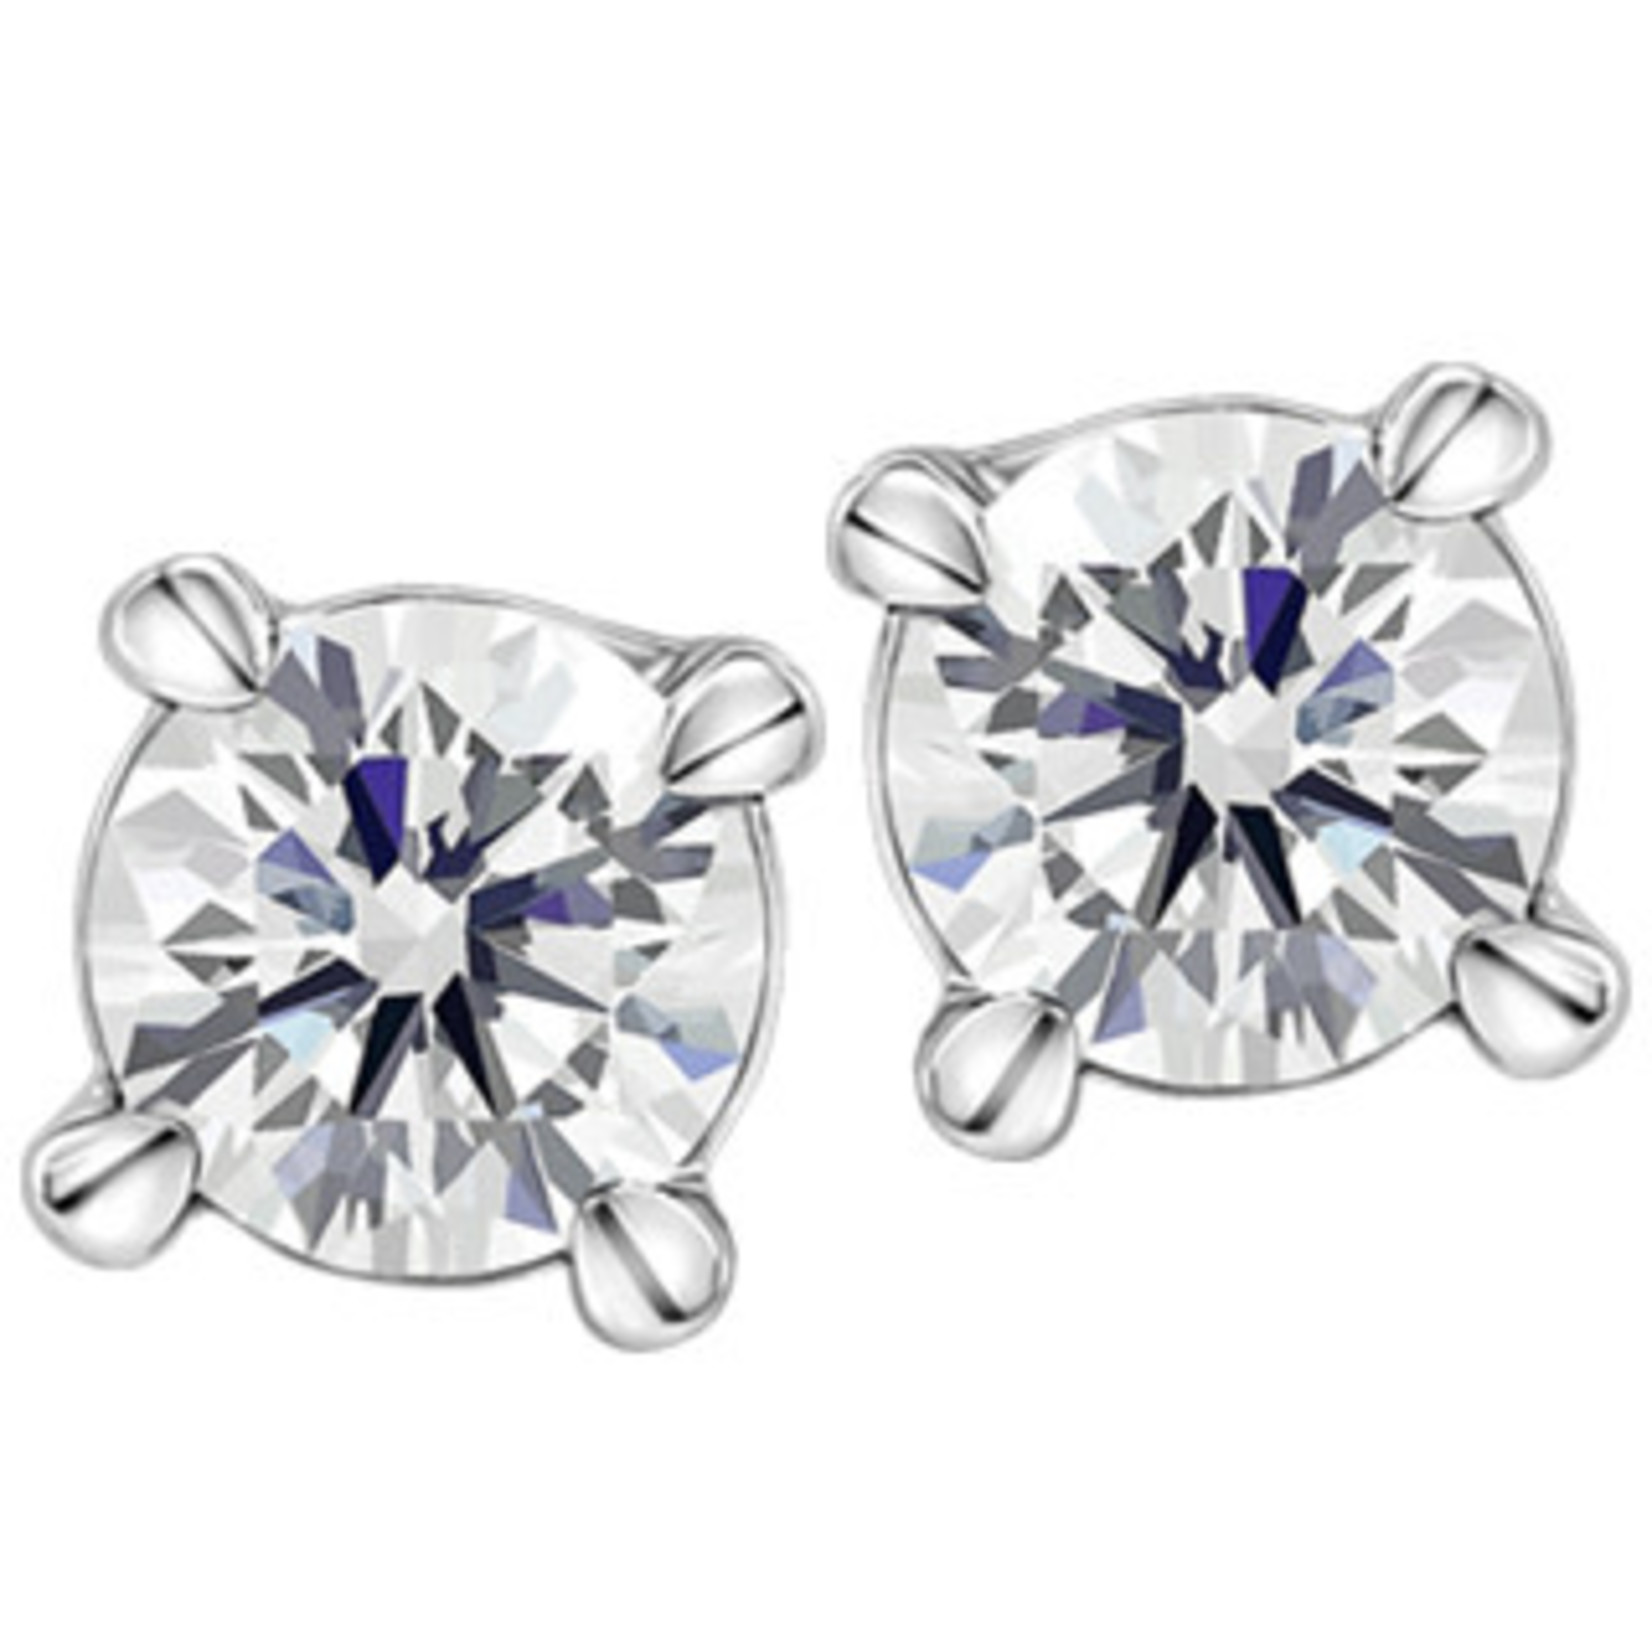 0.20CTW Round Brilliant Canadian Diamond Earrings